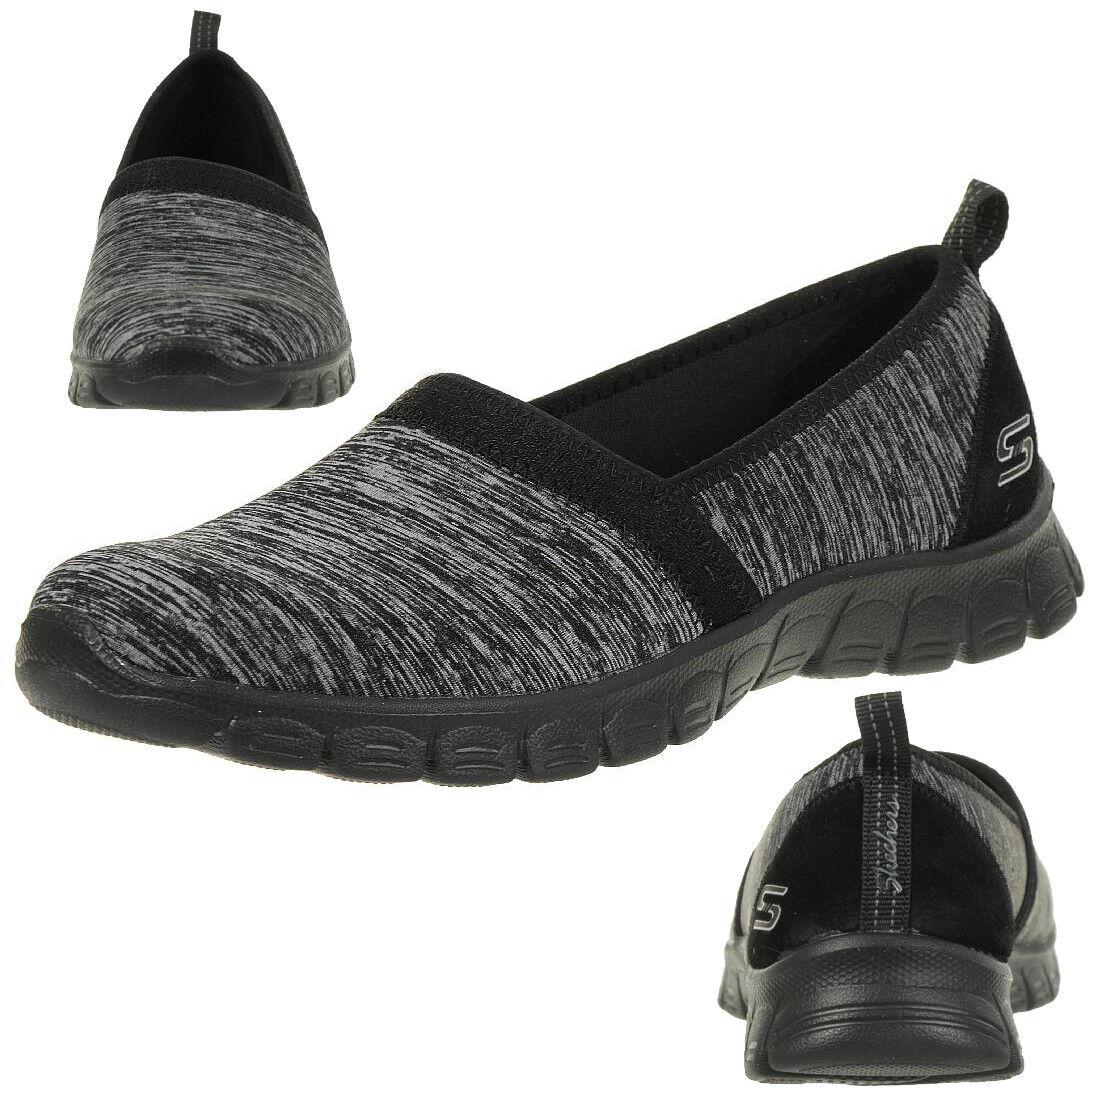 Skechers Ez Flex 3.0 Swift Mouvement Femmes Chaussures D'Été Mocassins BBK